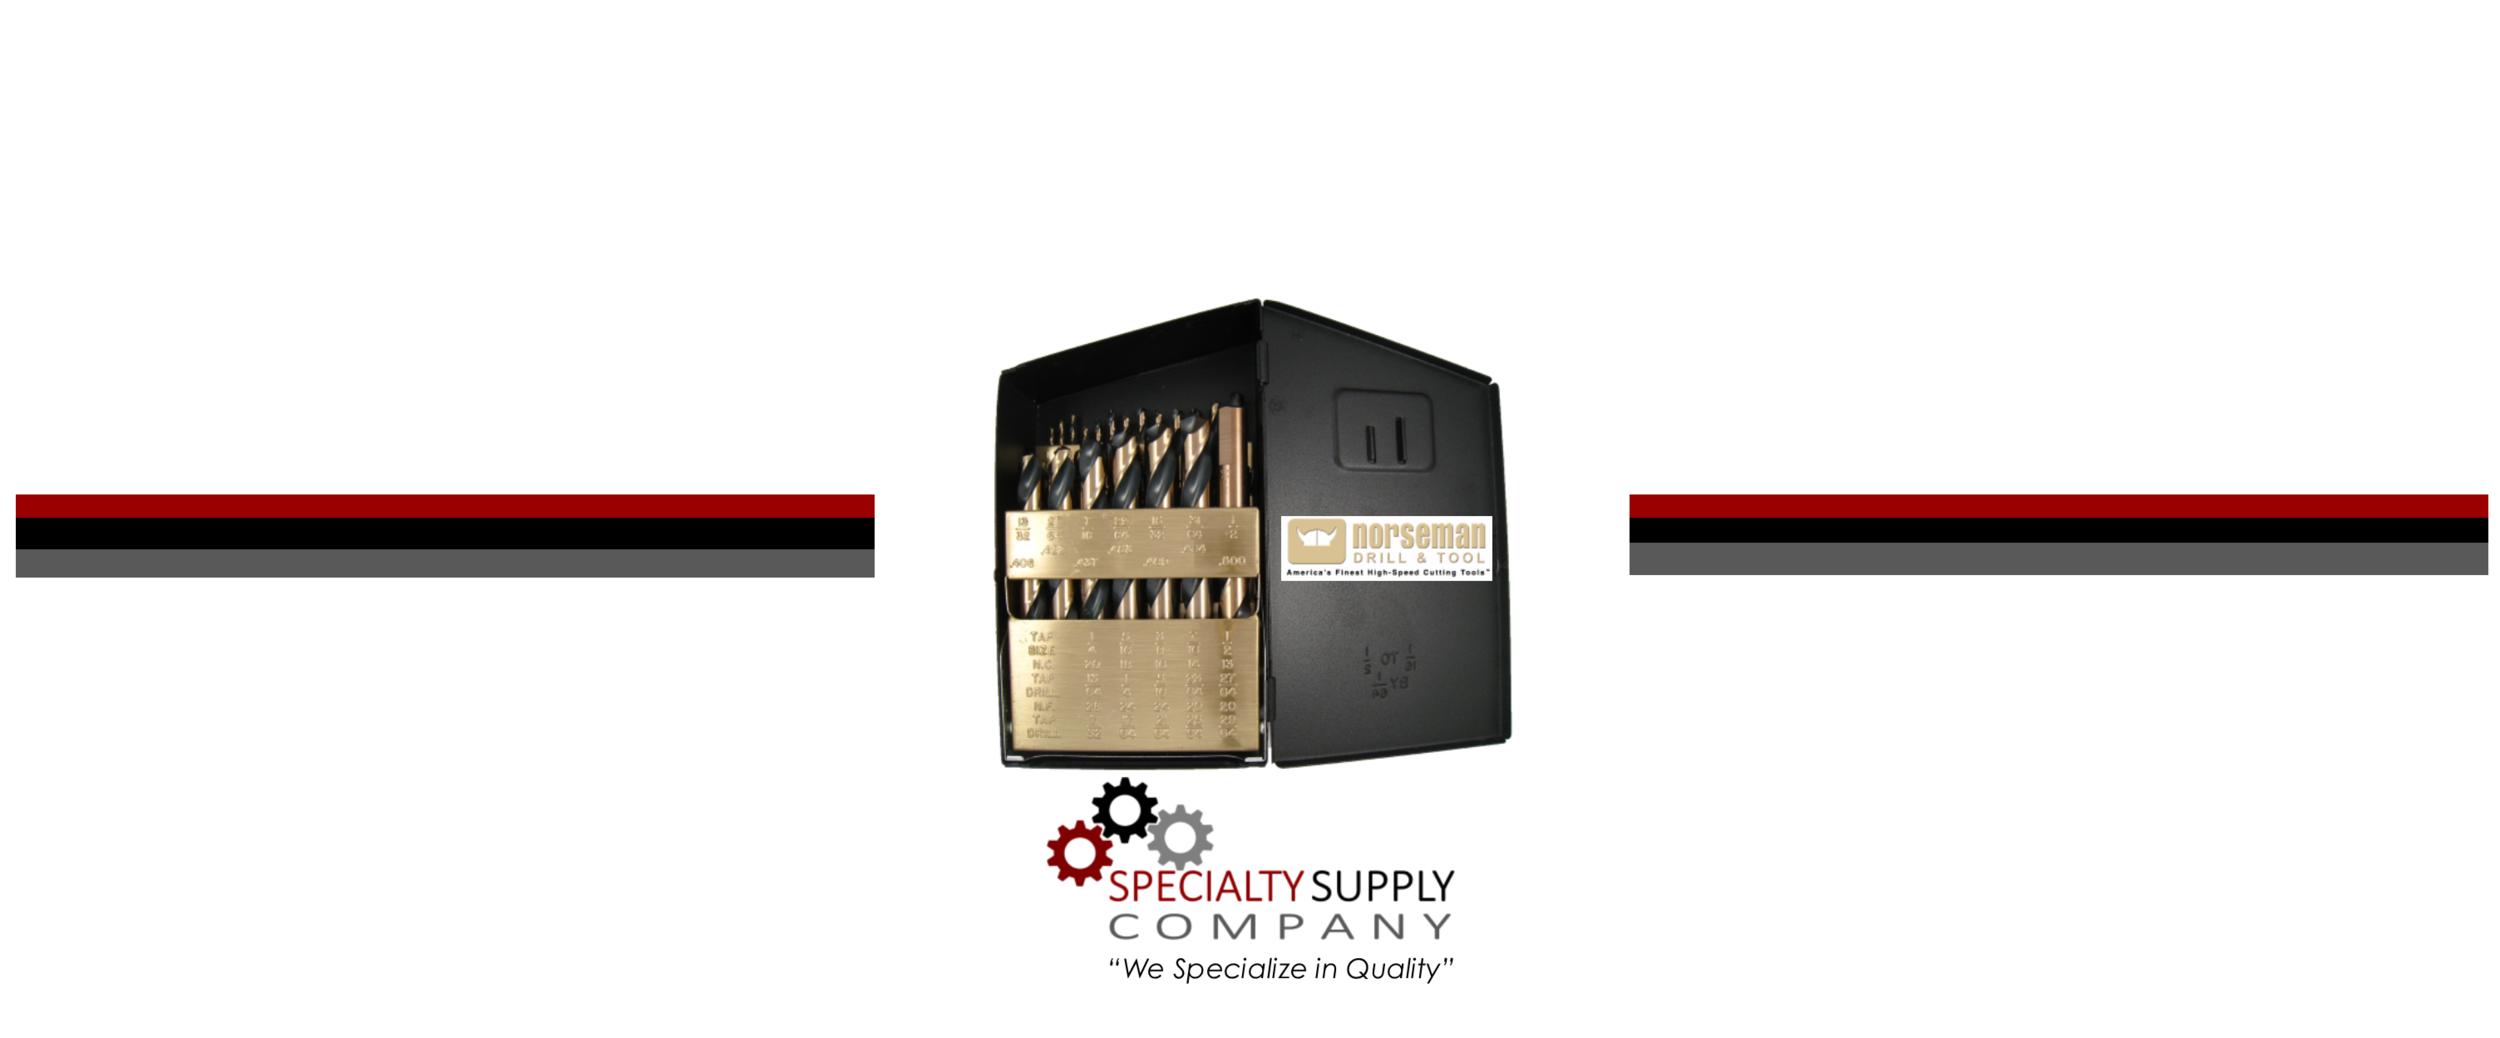 specialty-supply-company-eureka-drills-taps